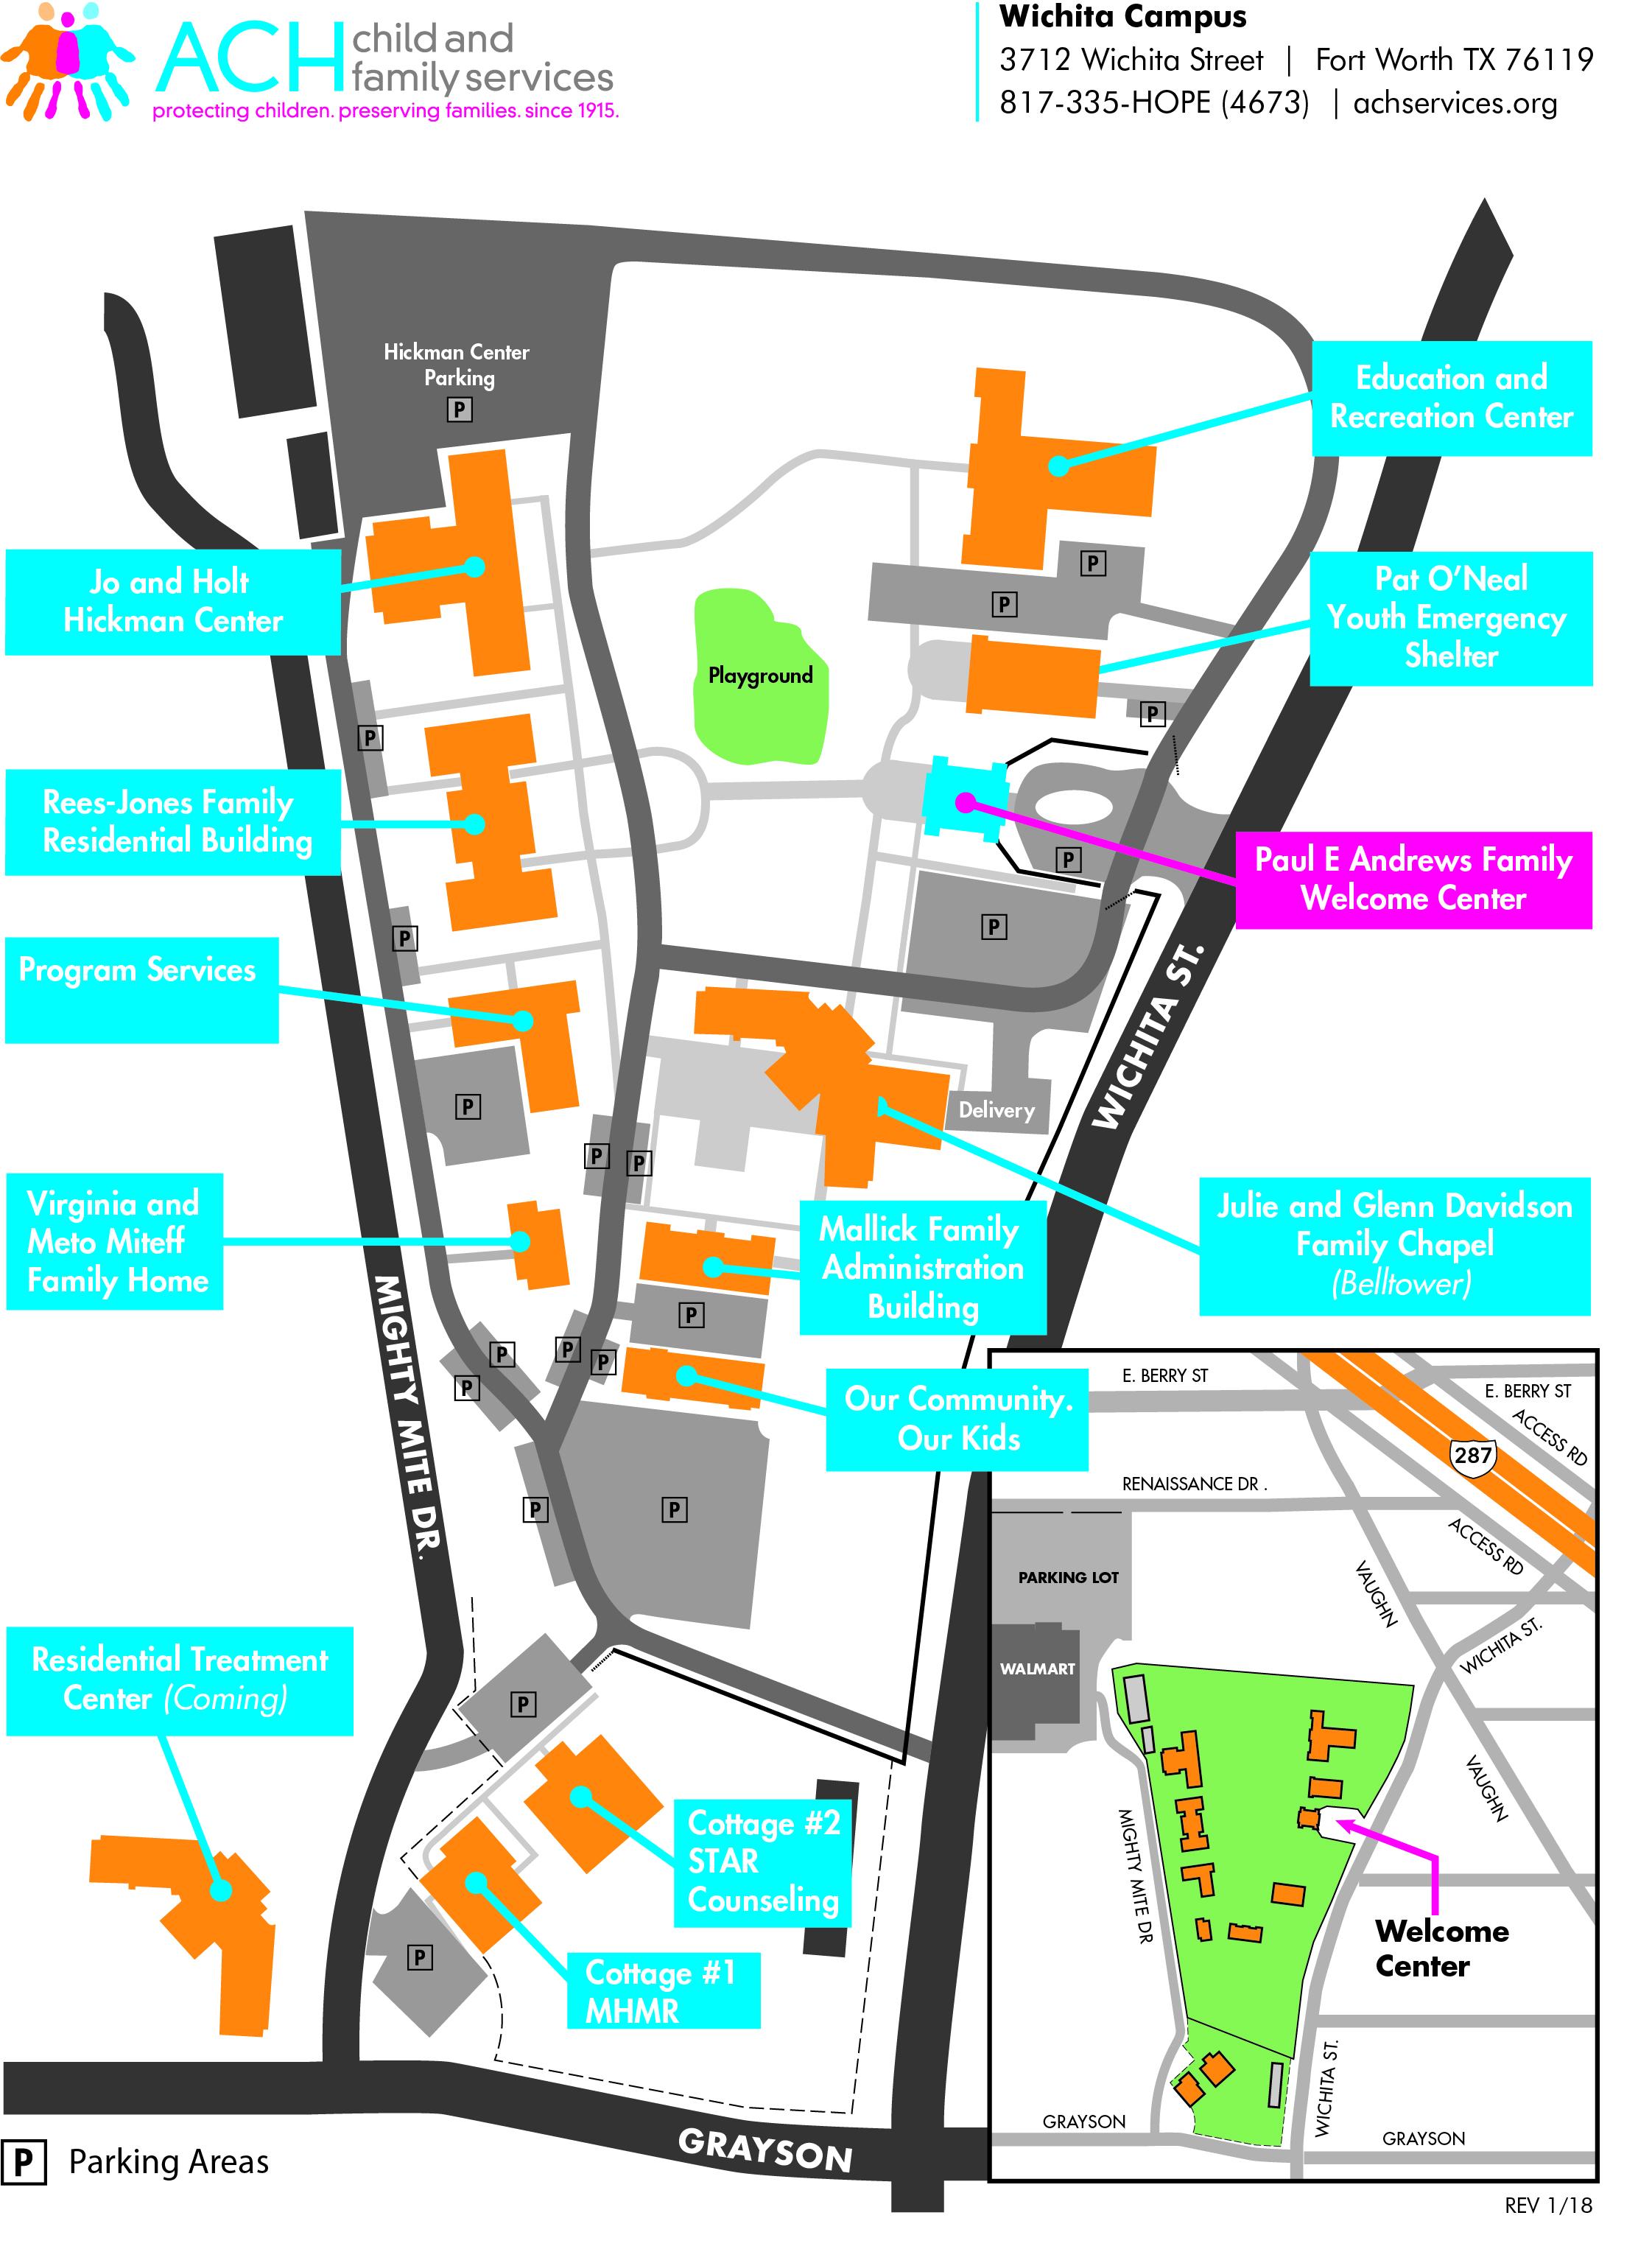 2018-Jan_Campus Map_8.5x11.jpg